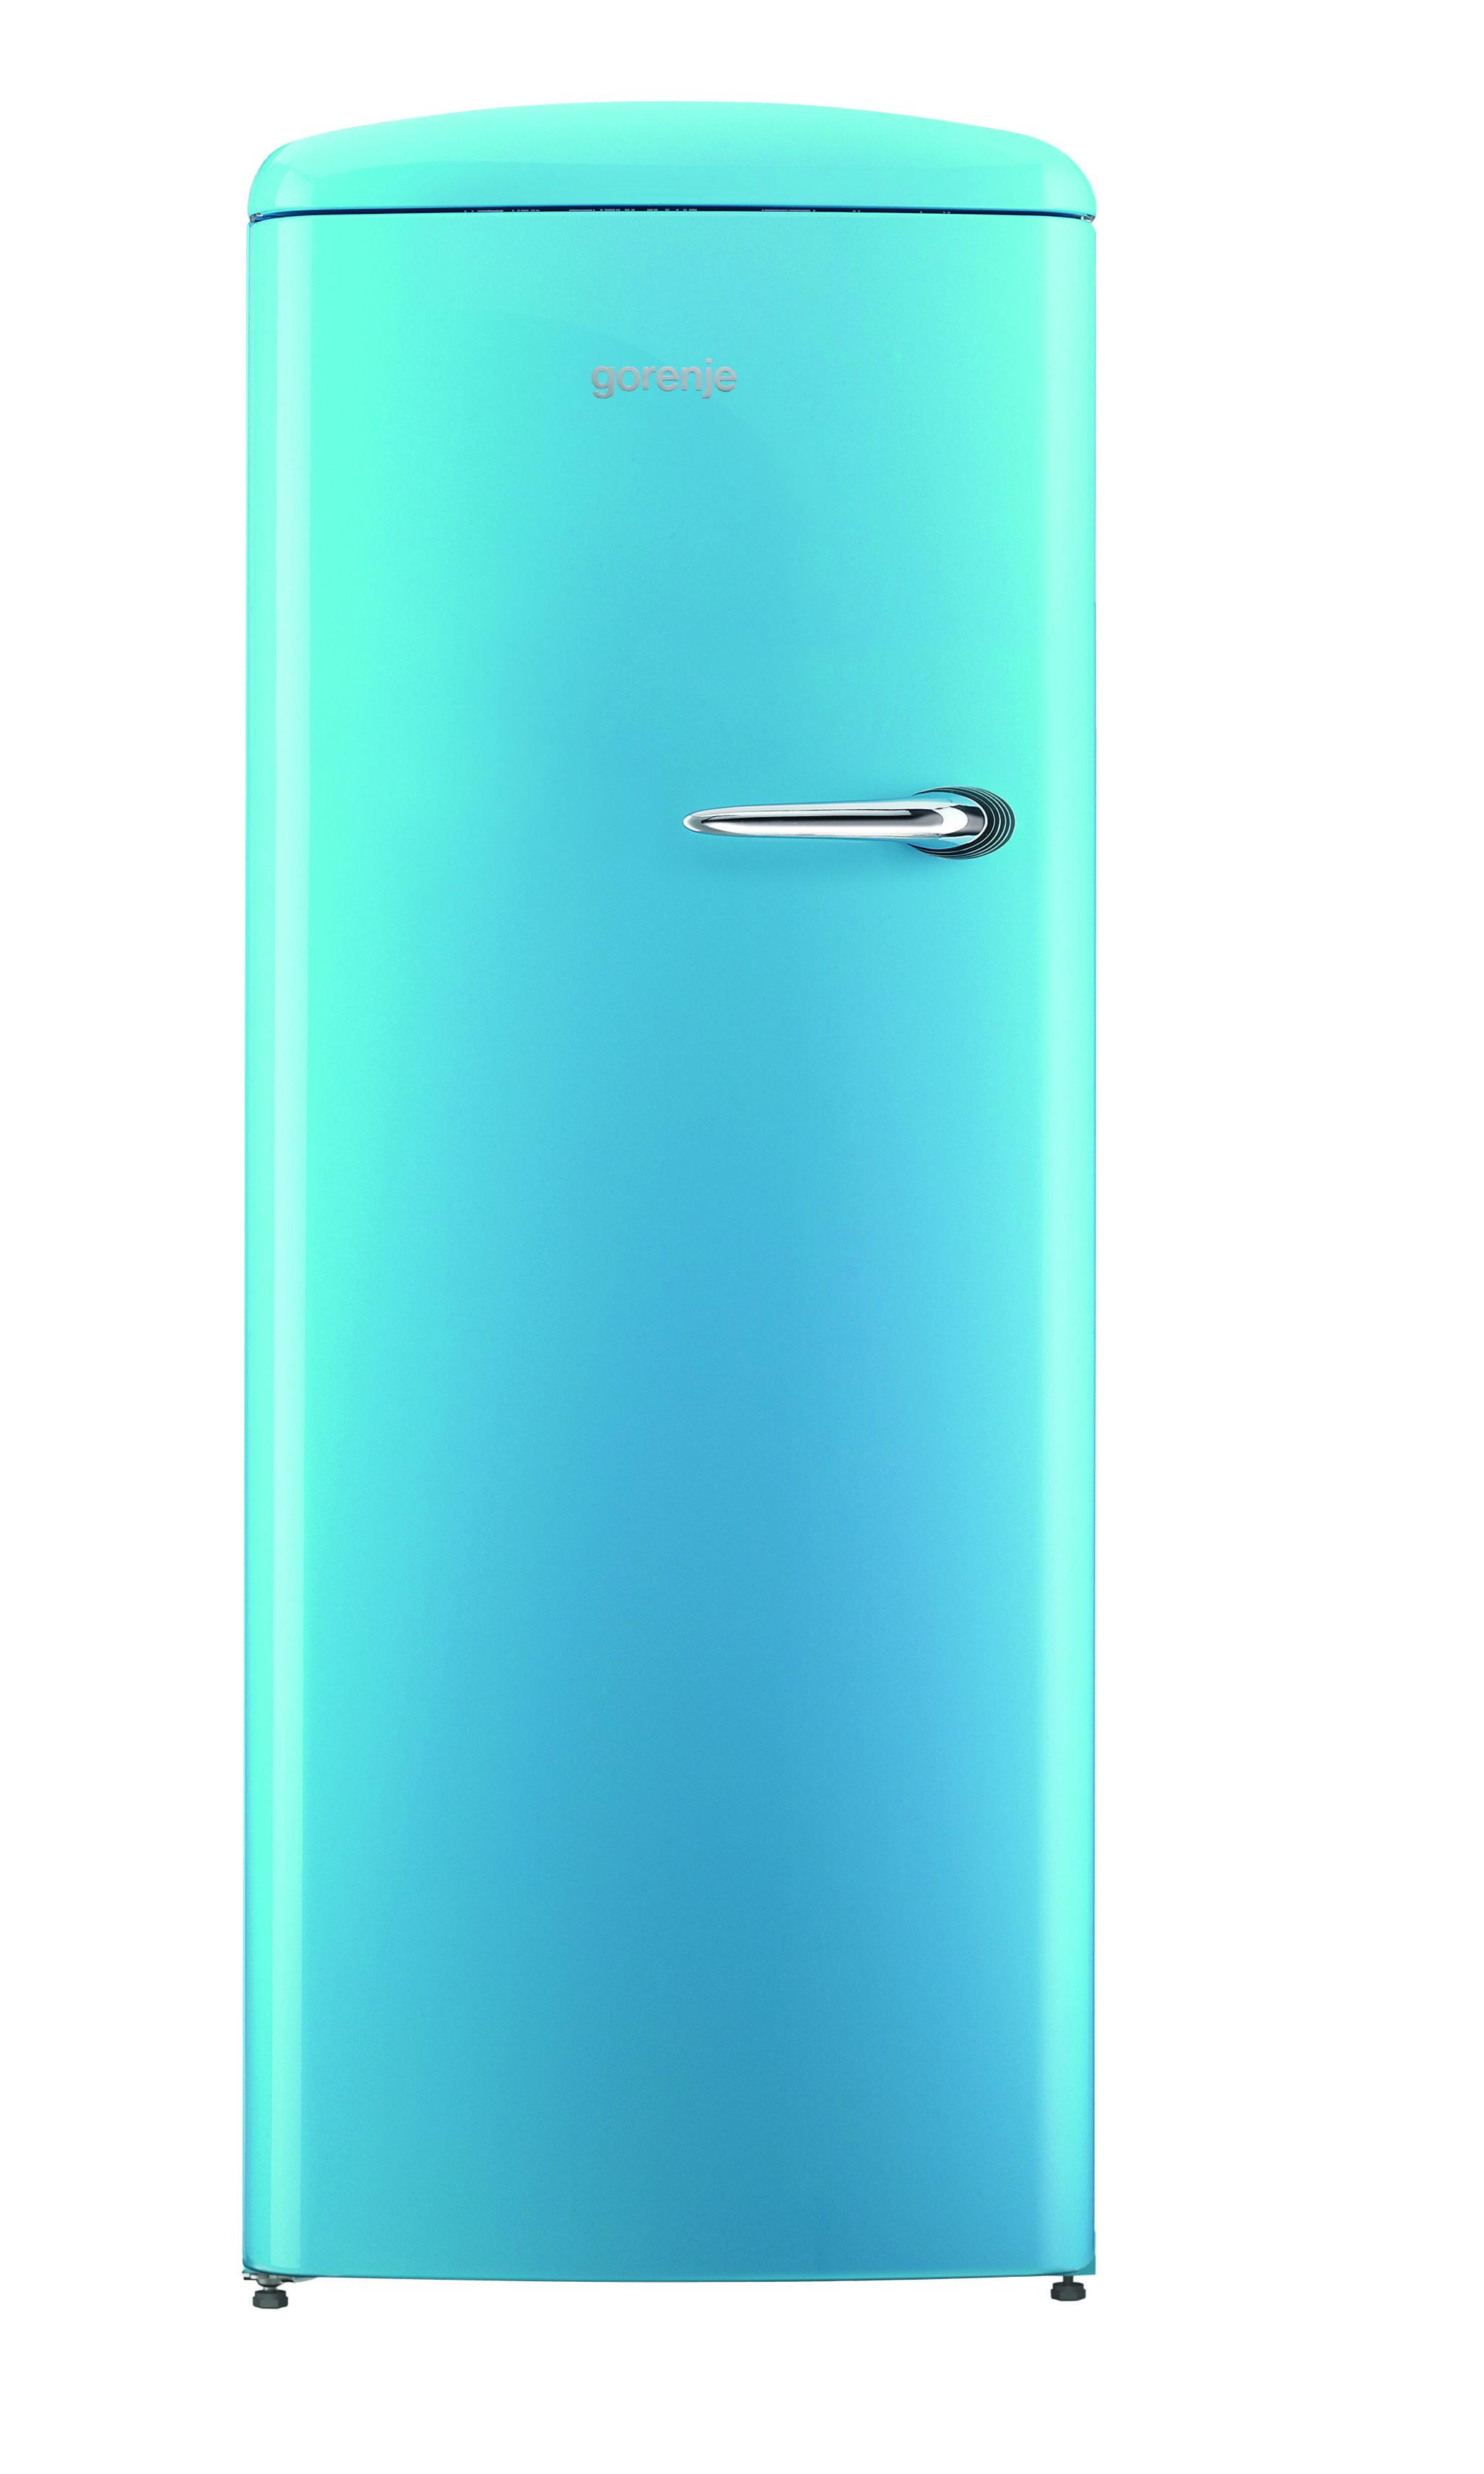 Gorenje Retro ORB153BL-L Refrigerator - Baby Blue - cut out ...